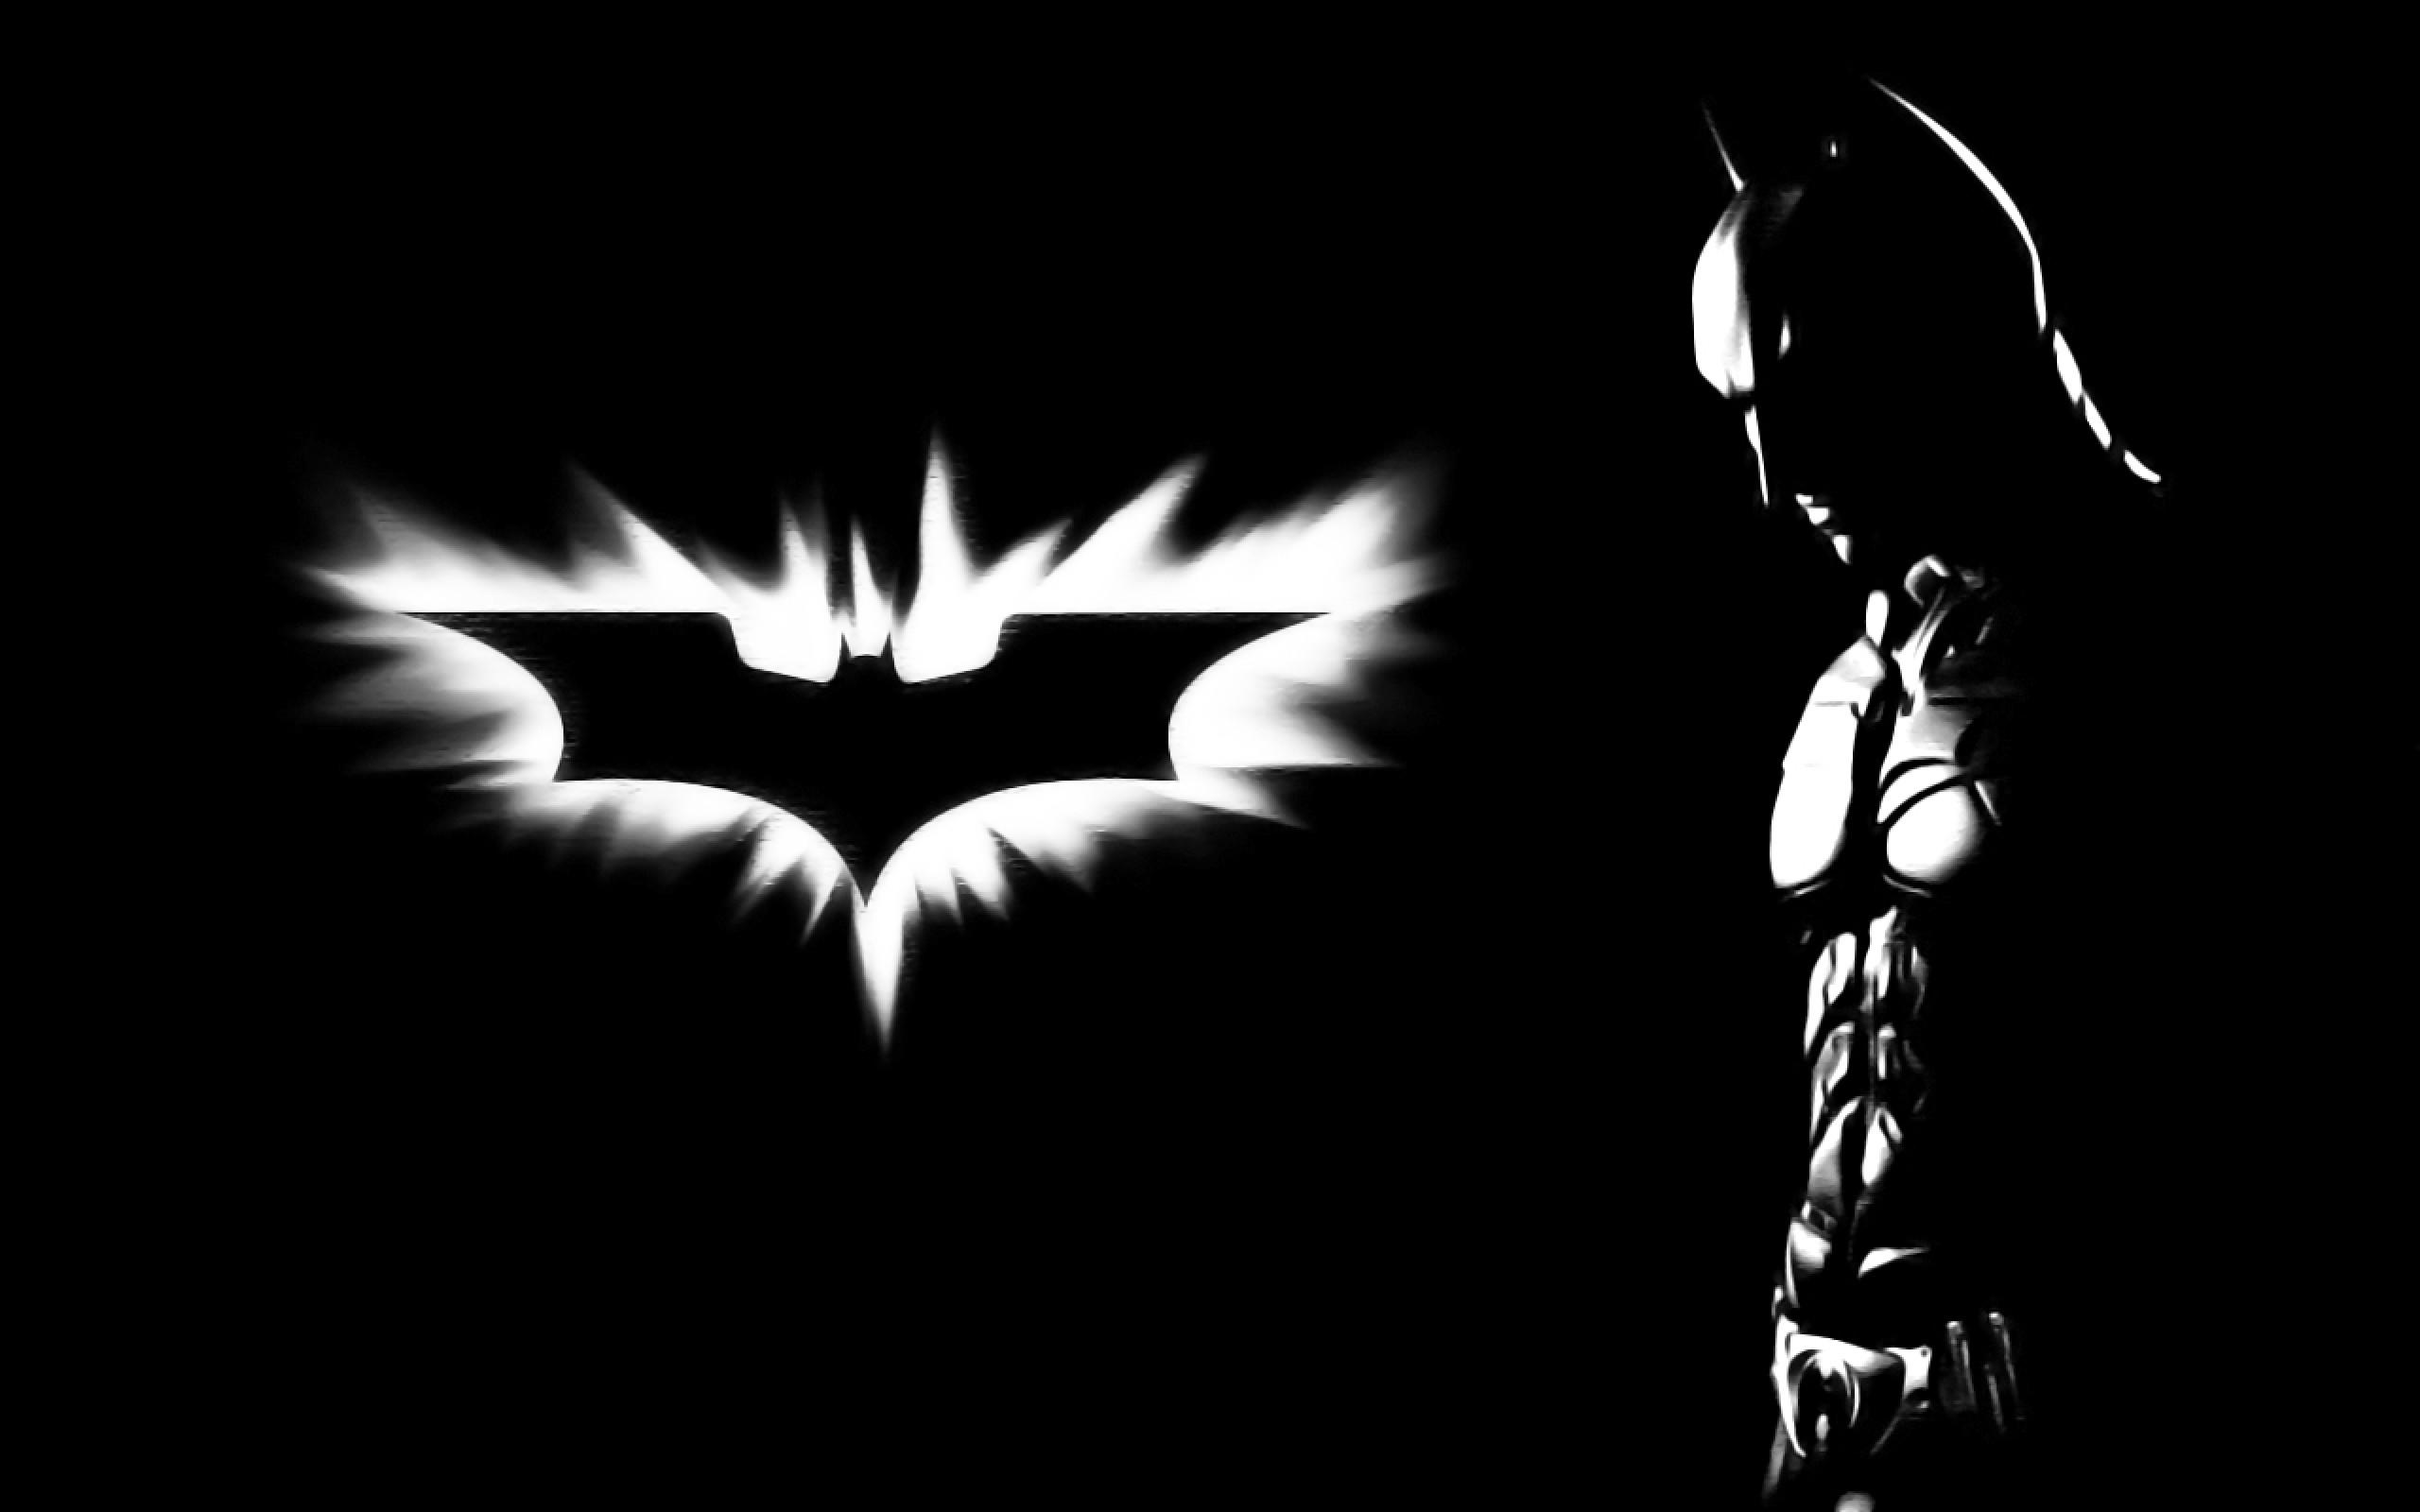 badass batman wallpaper, free images of batman